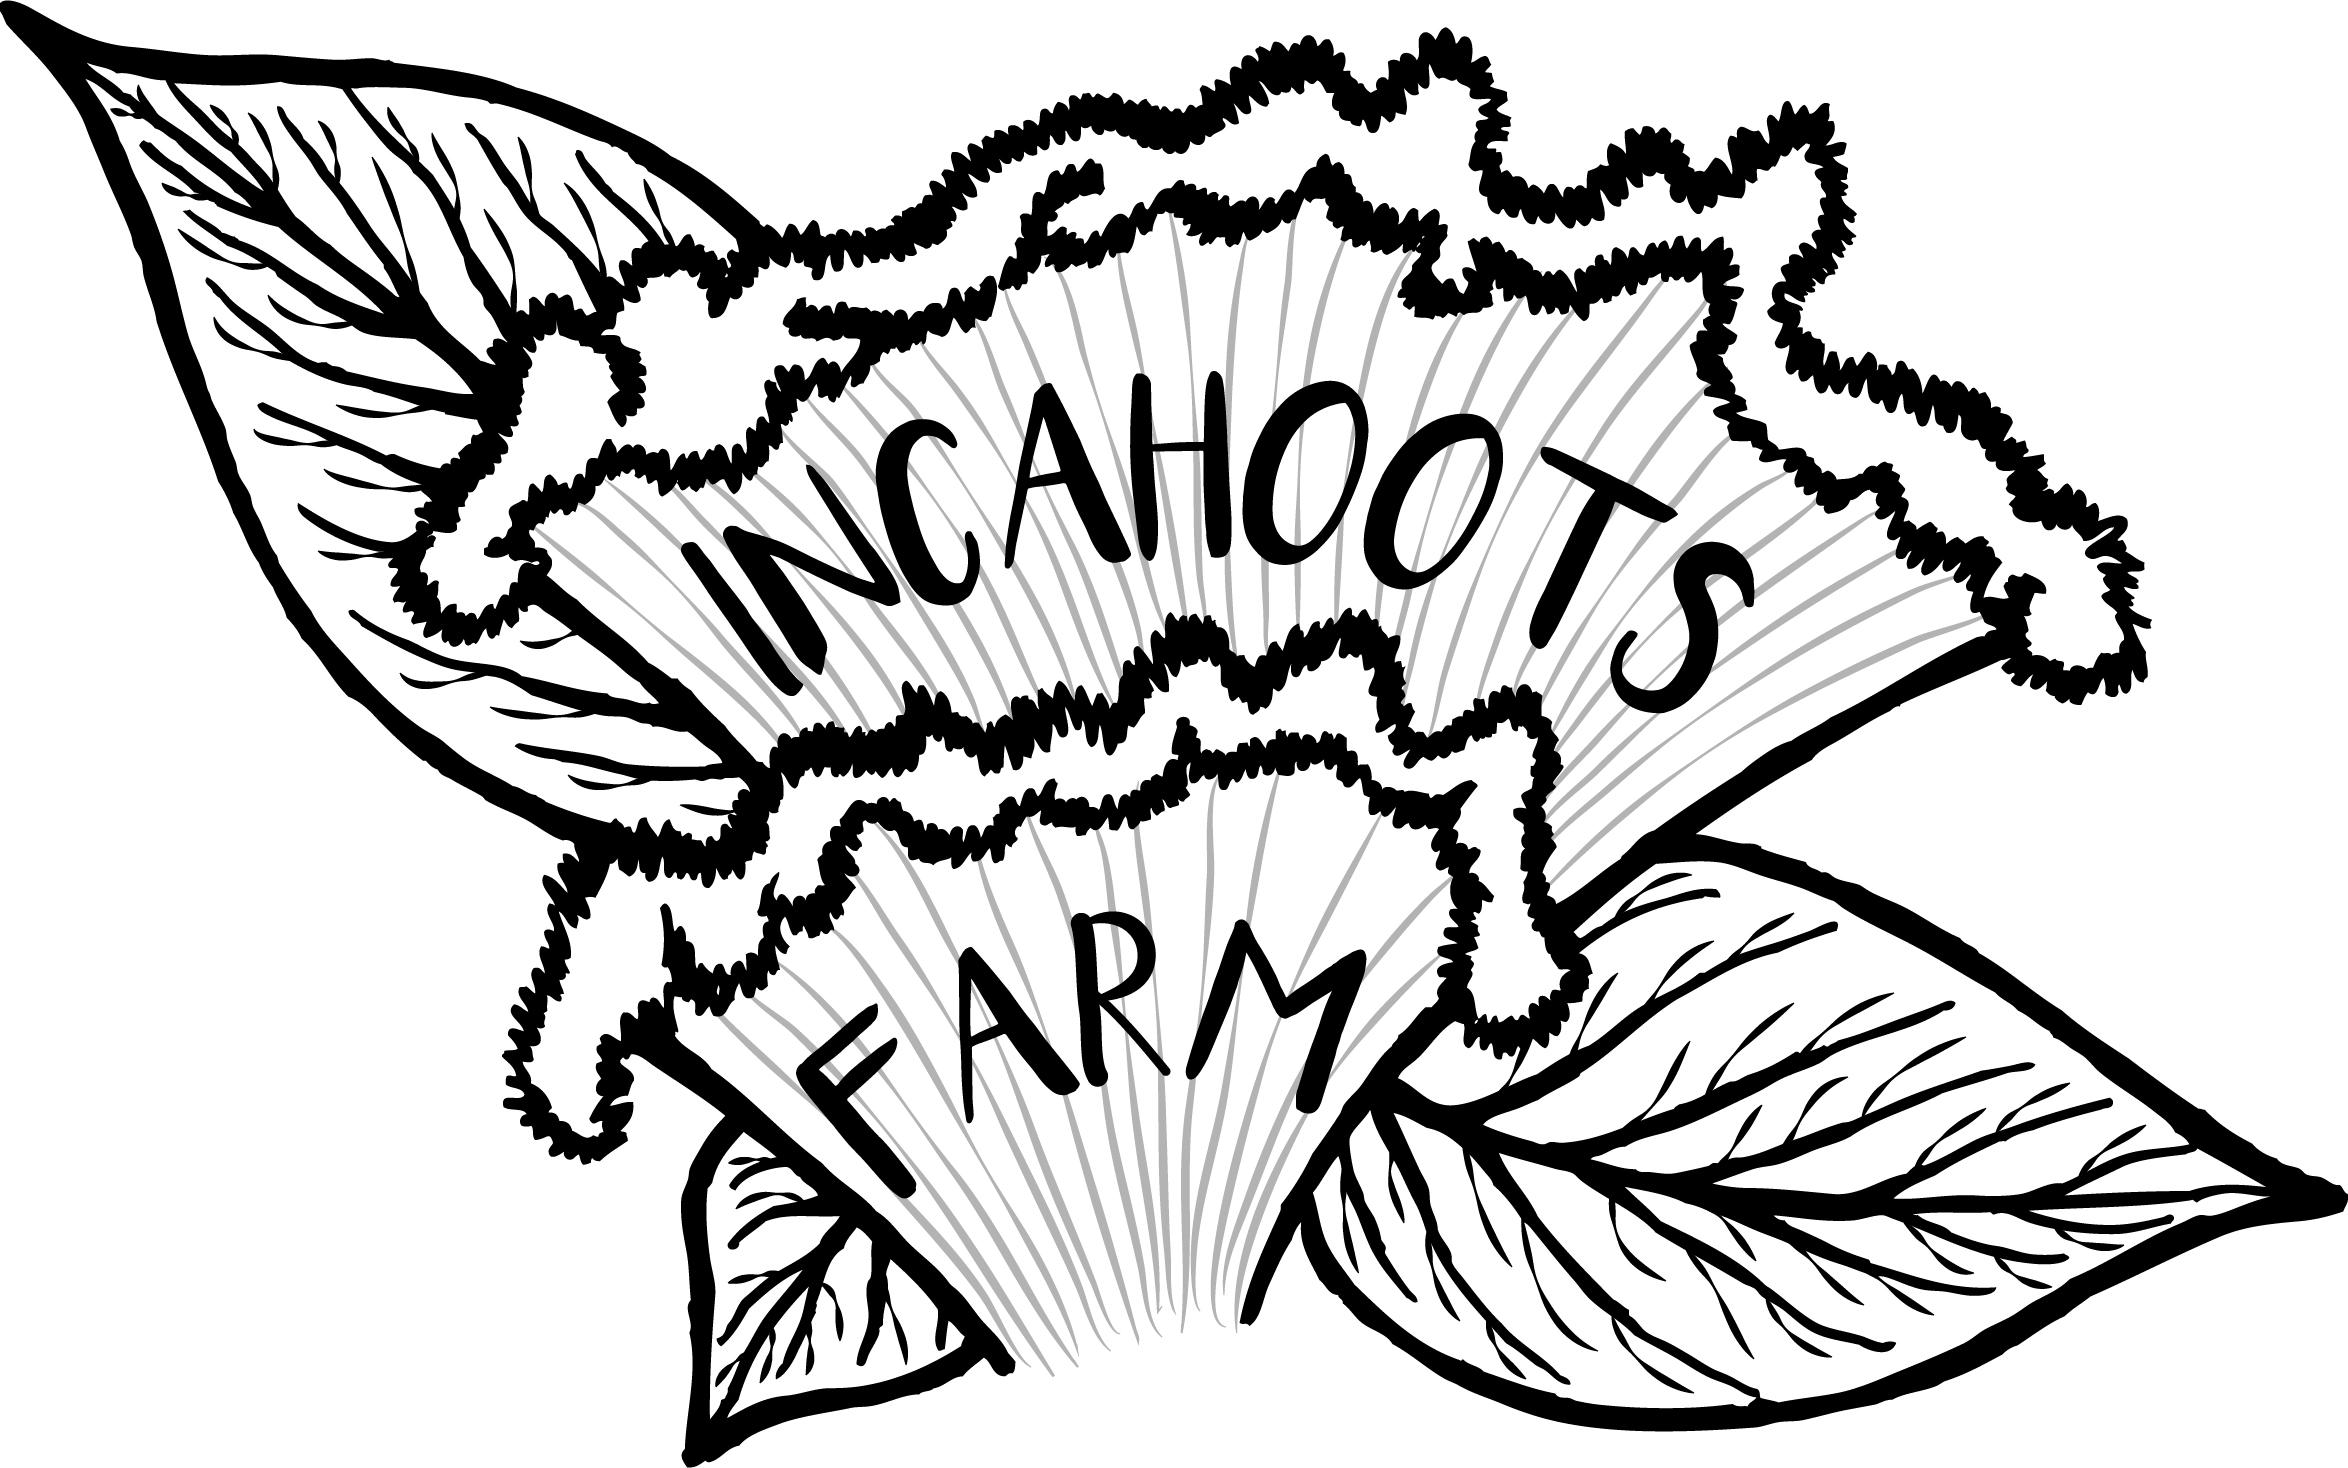 Incahoots Farm